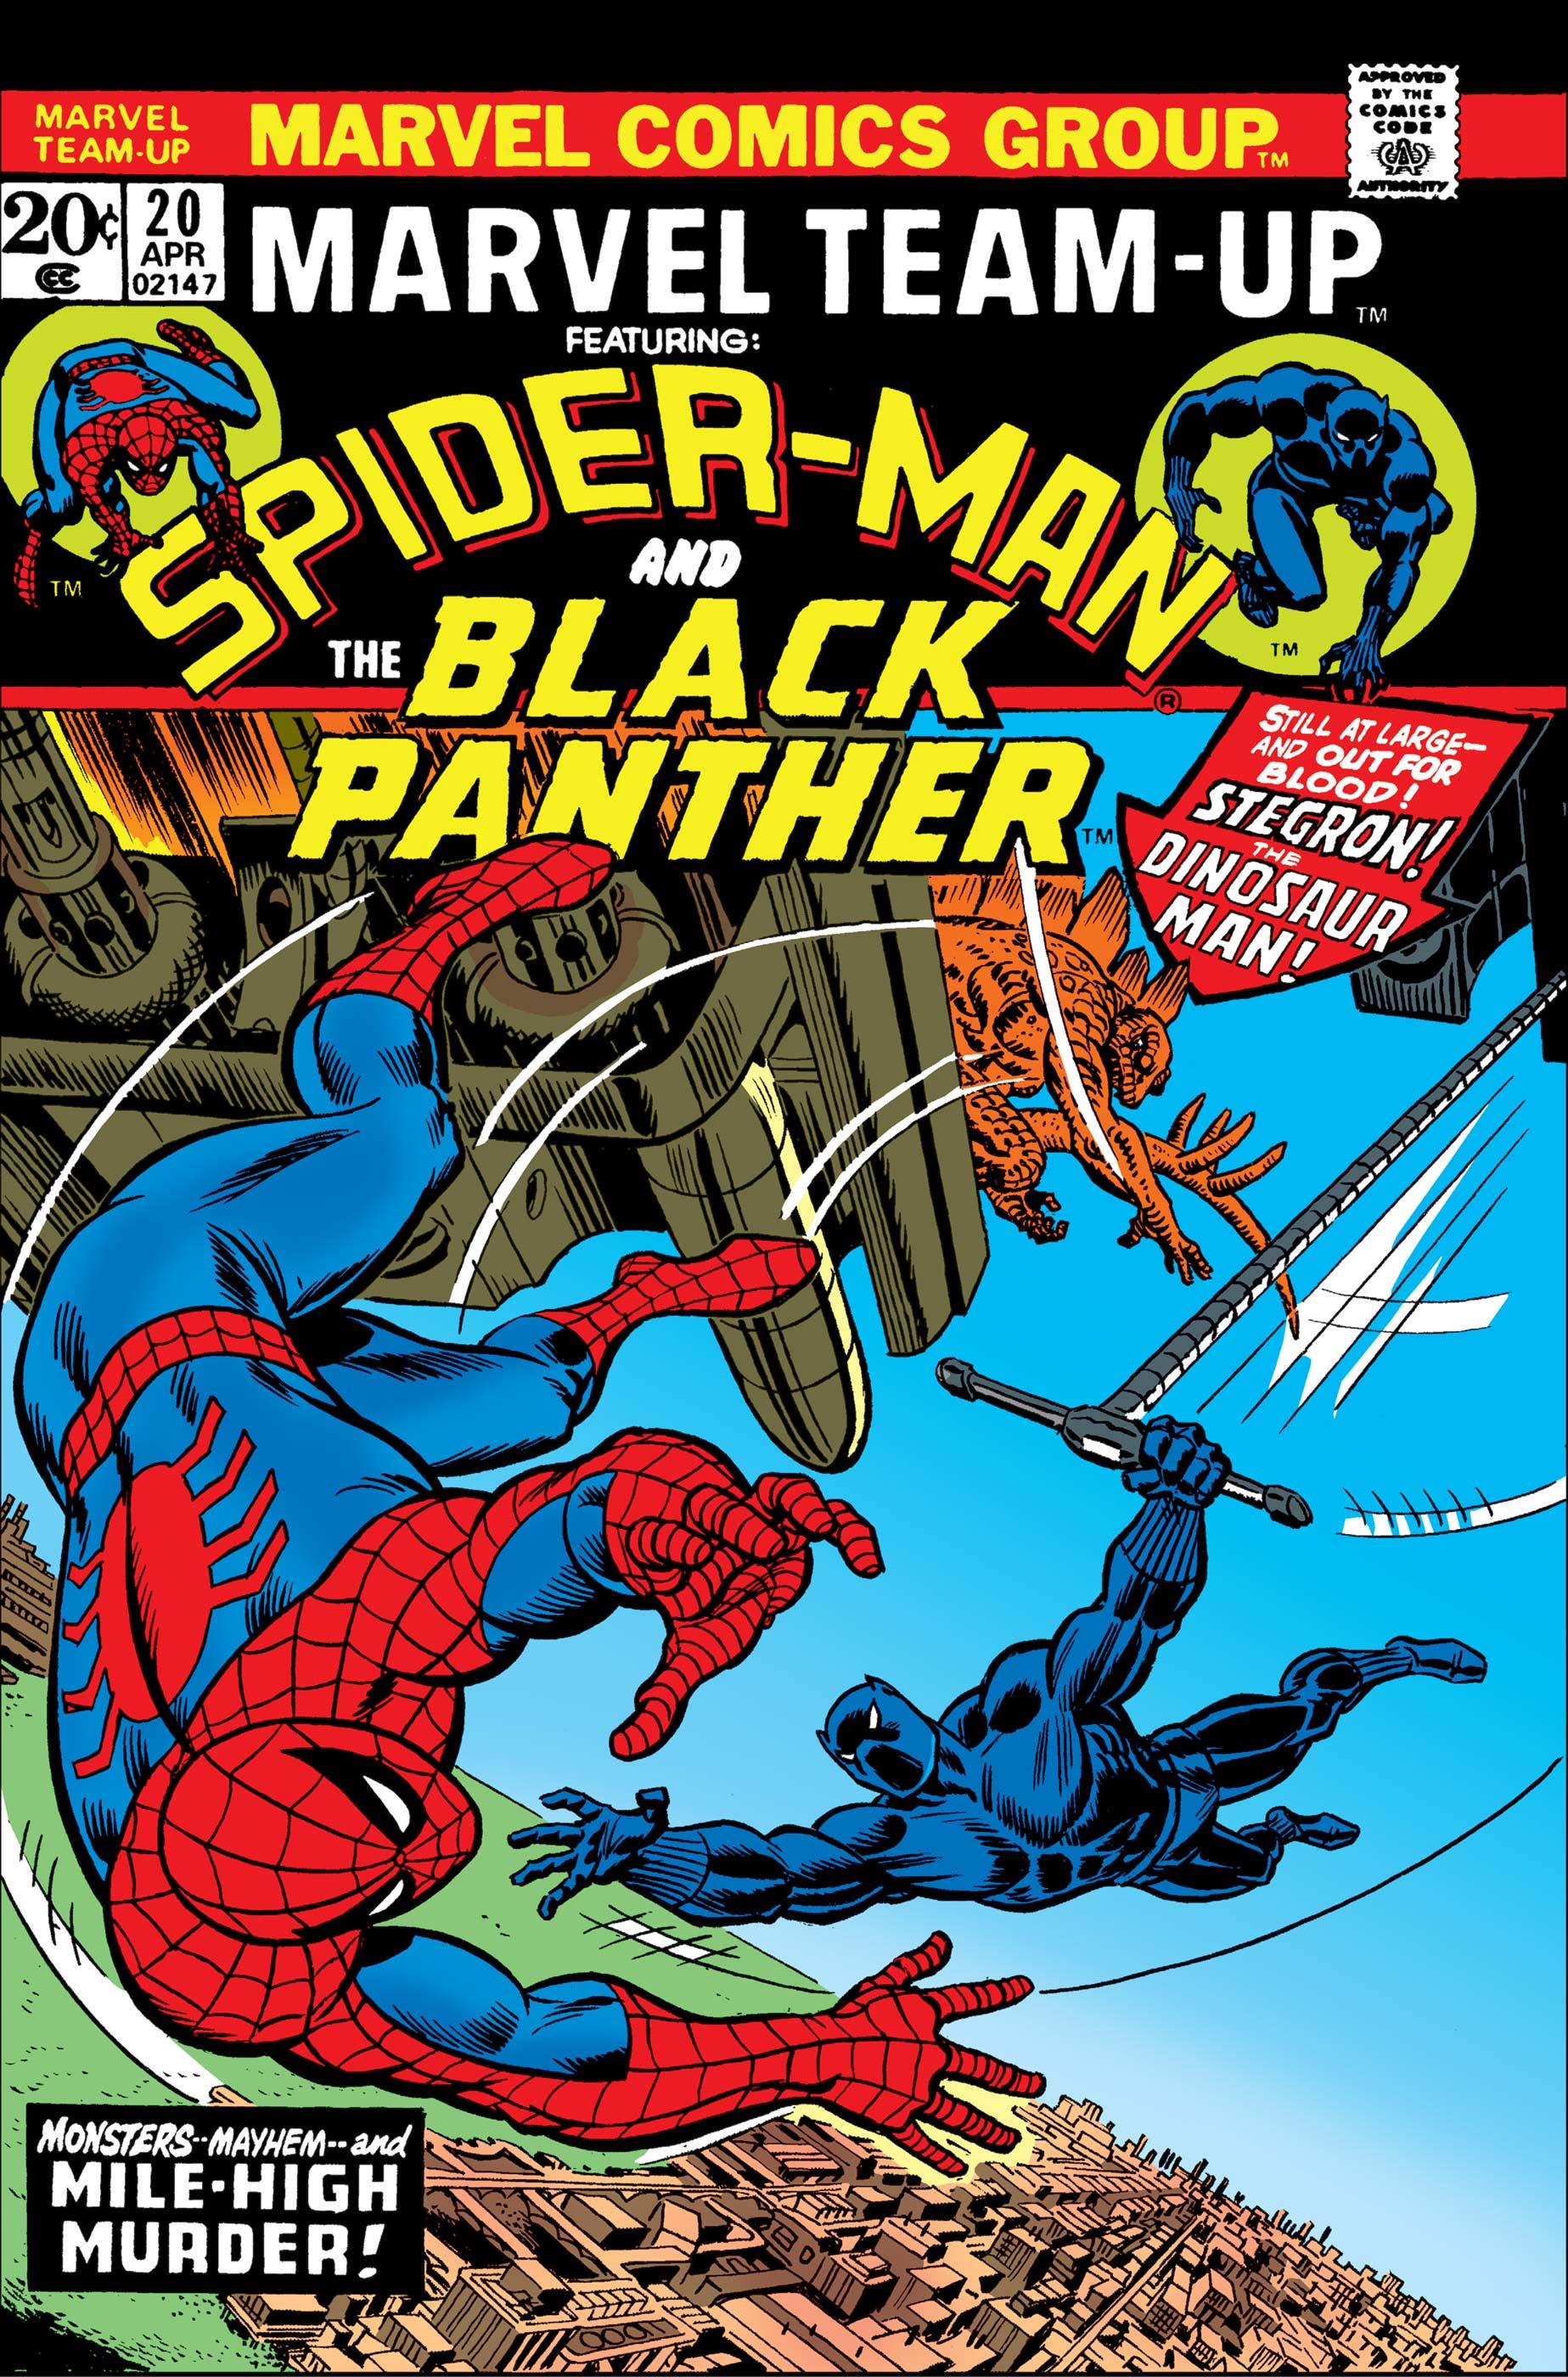 Marvel Team-Up (1972) #20